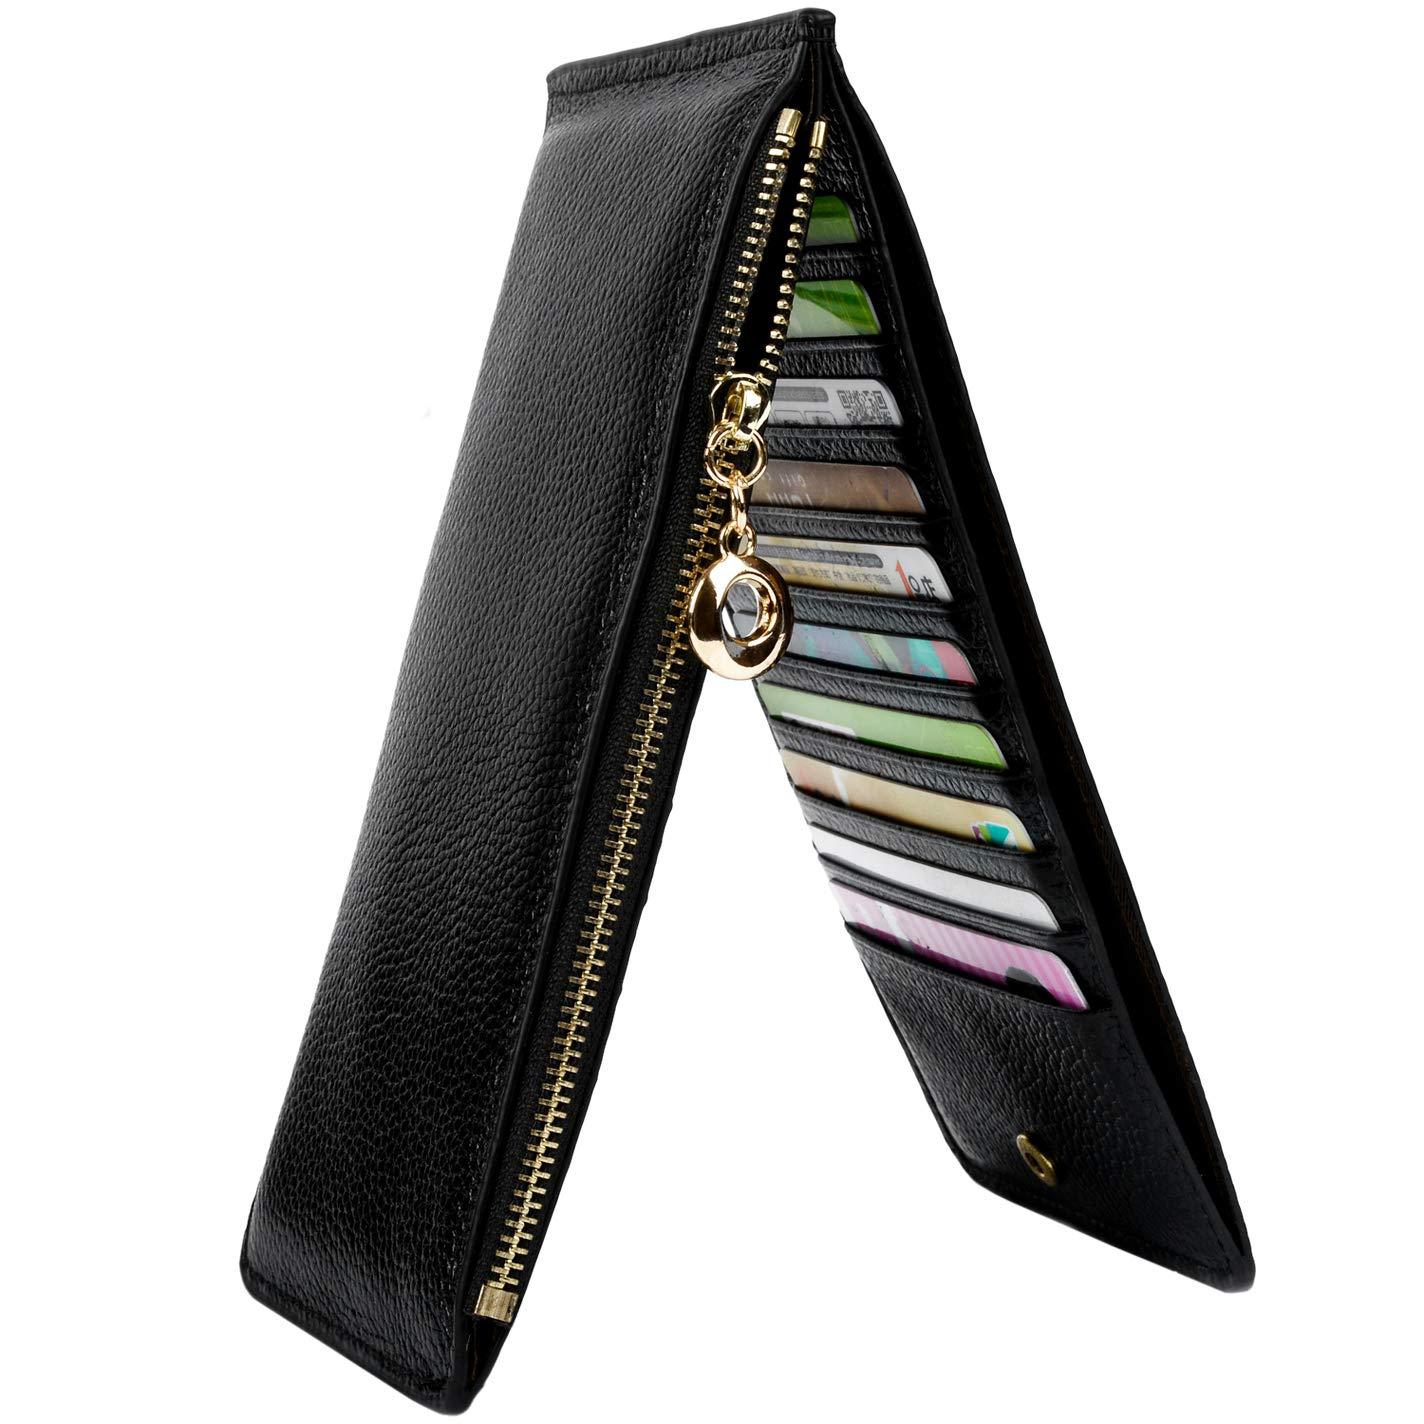 YALUXE Leather Wallet for Women Women's RFID Blocking Genuine Leather Multi Card Organizer Wallet with Zipper Pocket RFID Blocking Black